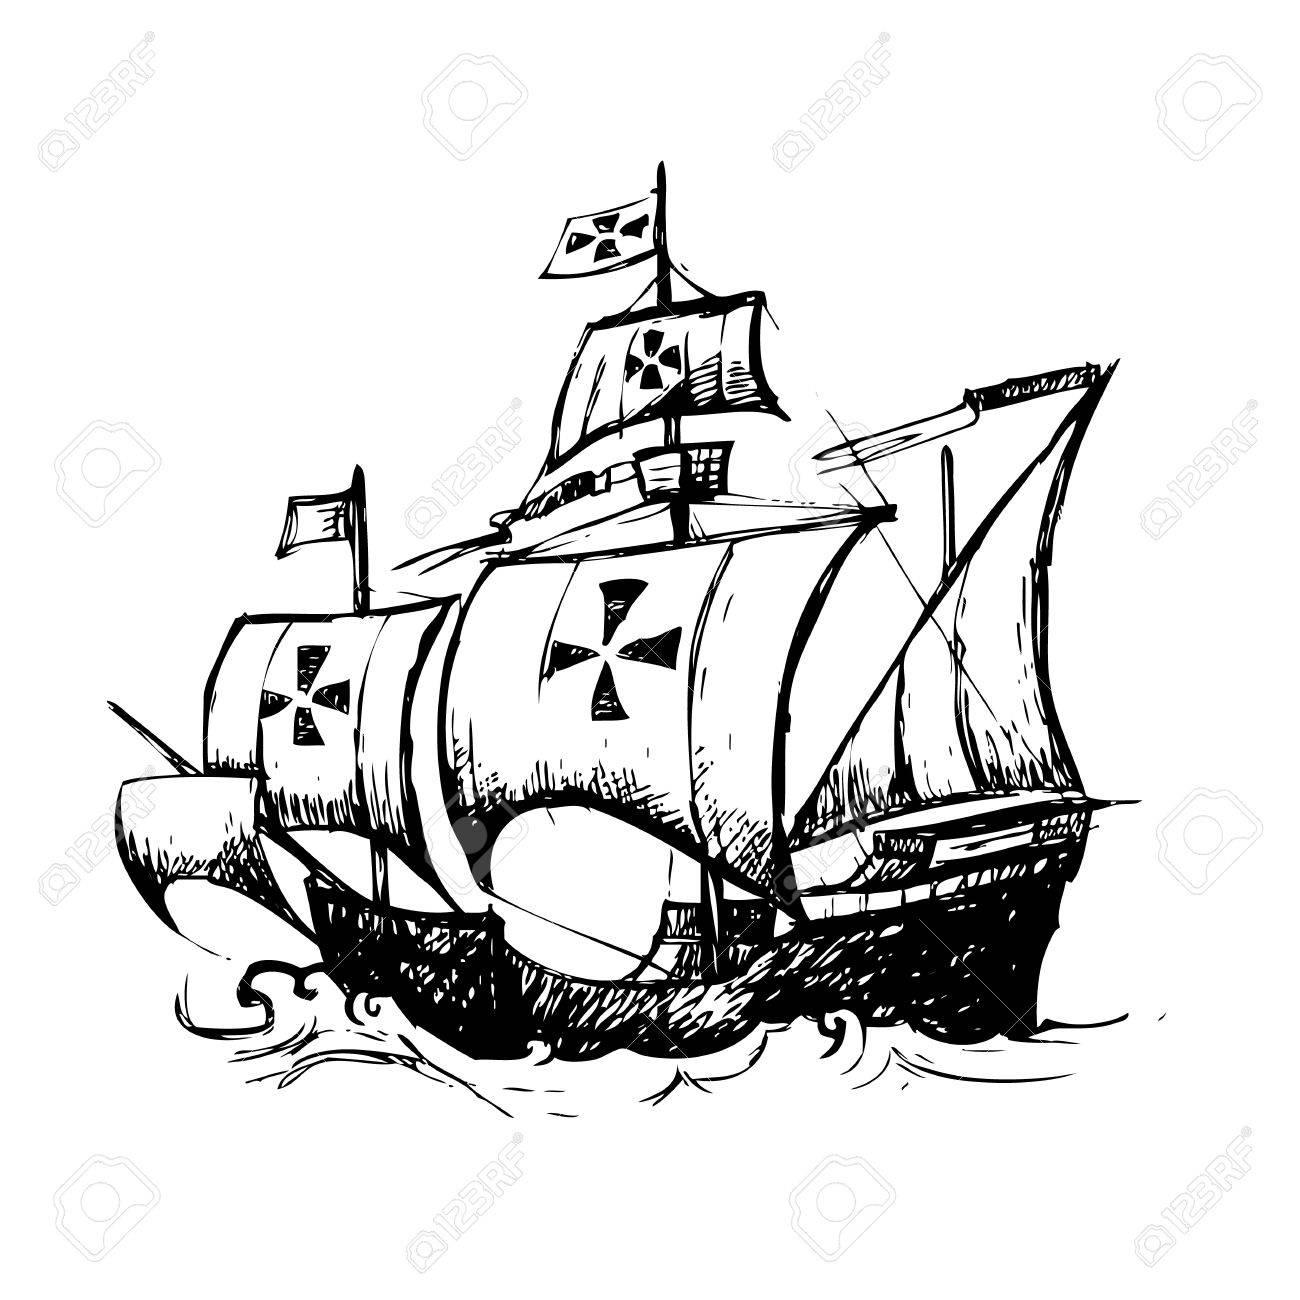 columbus ship hand drawn by pencil use for columbus day royalty rh 123rf com